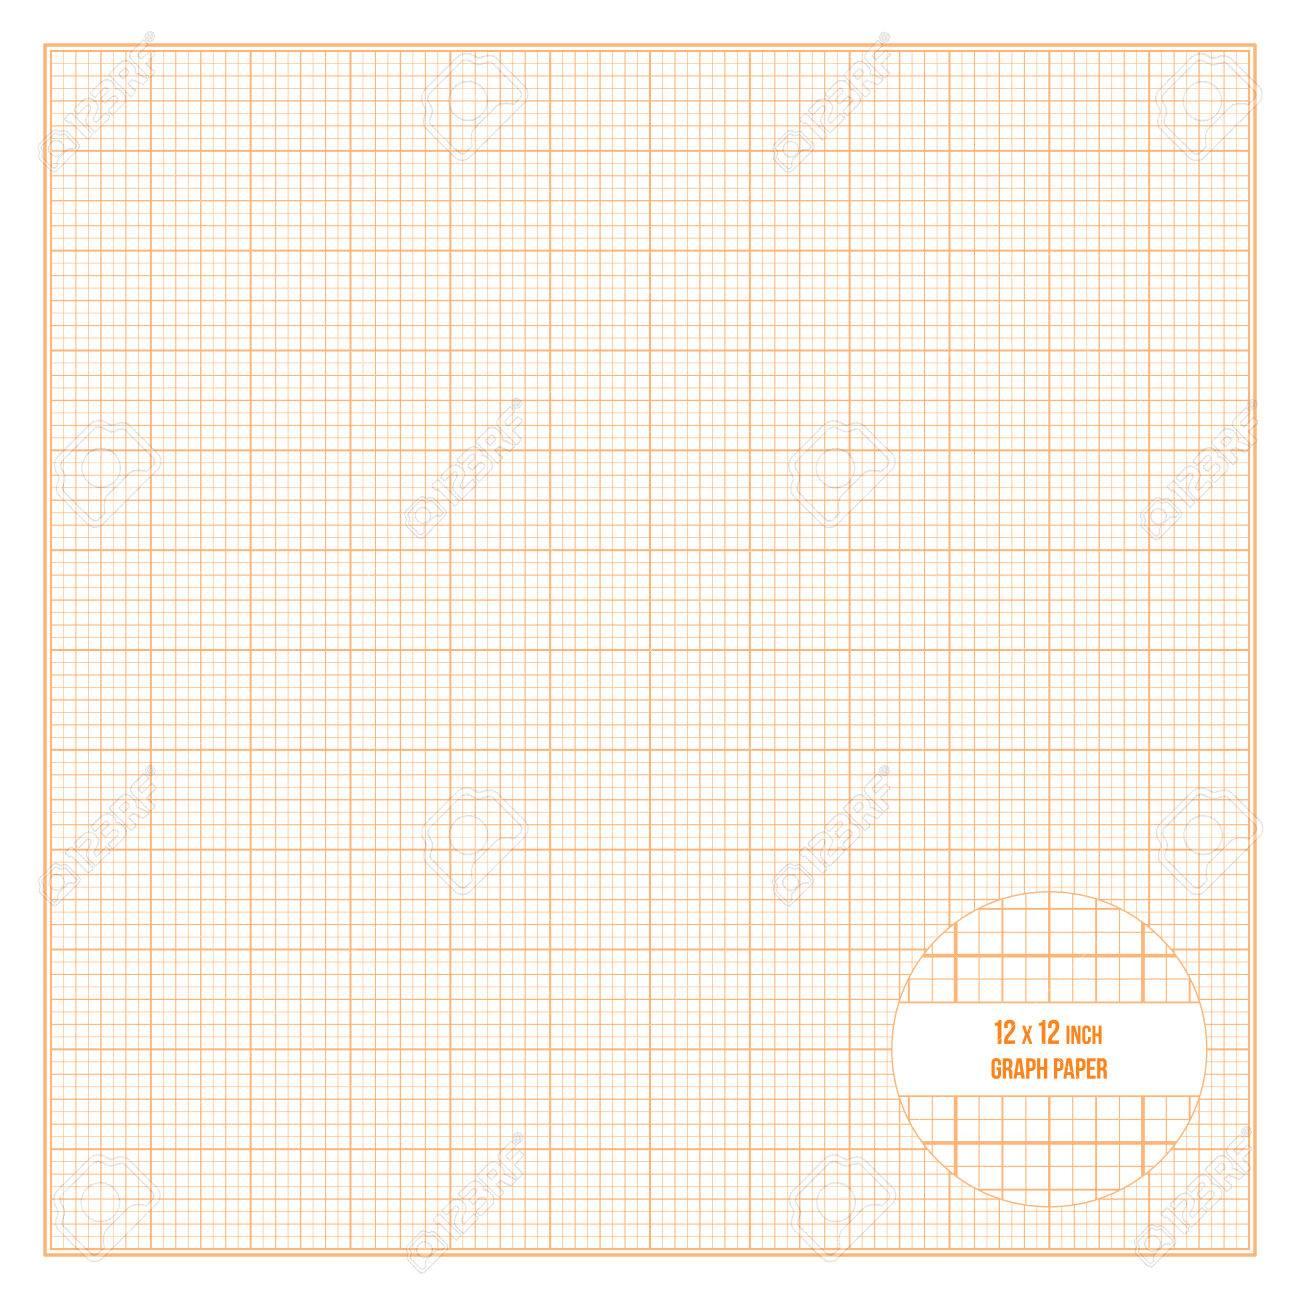 Vector orange printable graph paper 12x12 inch size grid accented vector vector orange printable graph paper 12x12 inch size grid accented every inch malvernweather Gallery